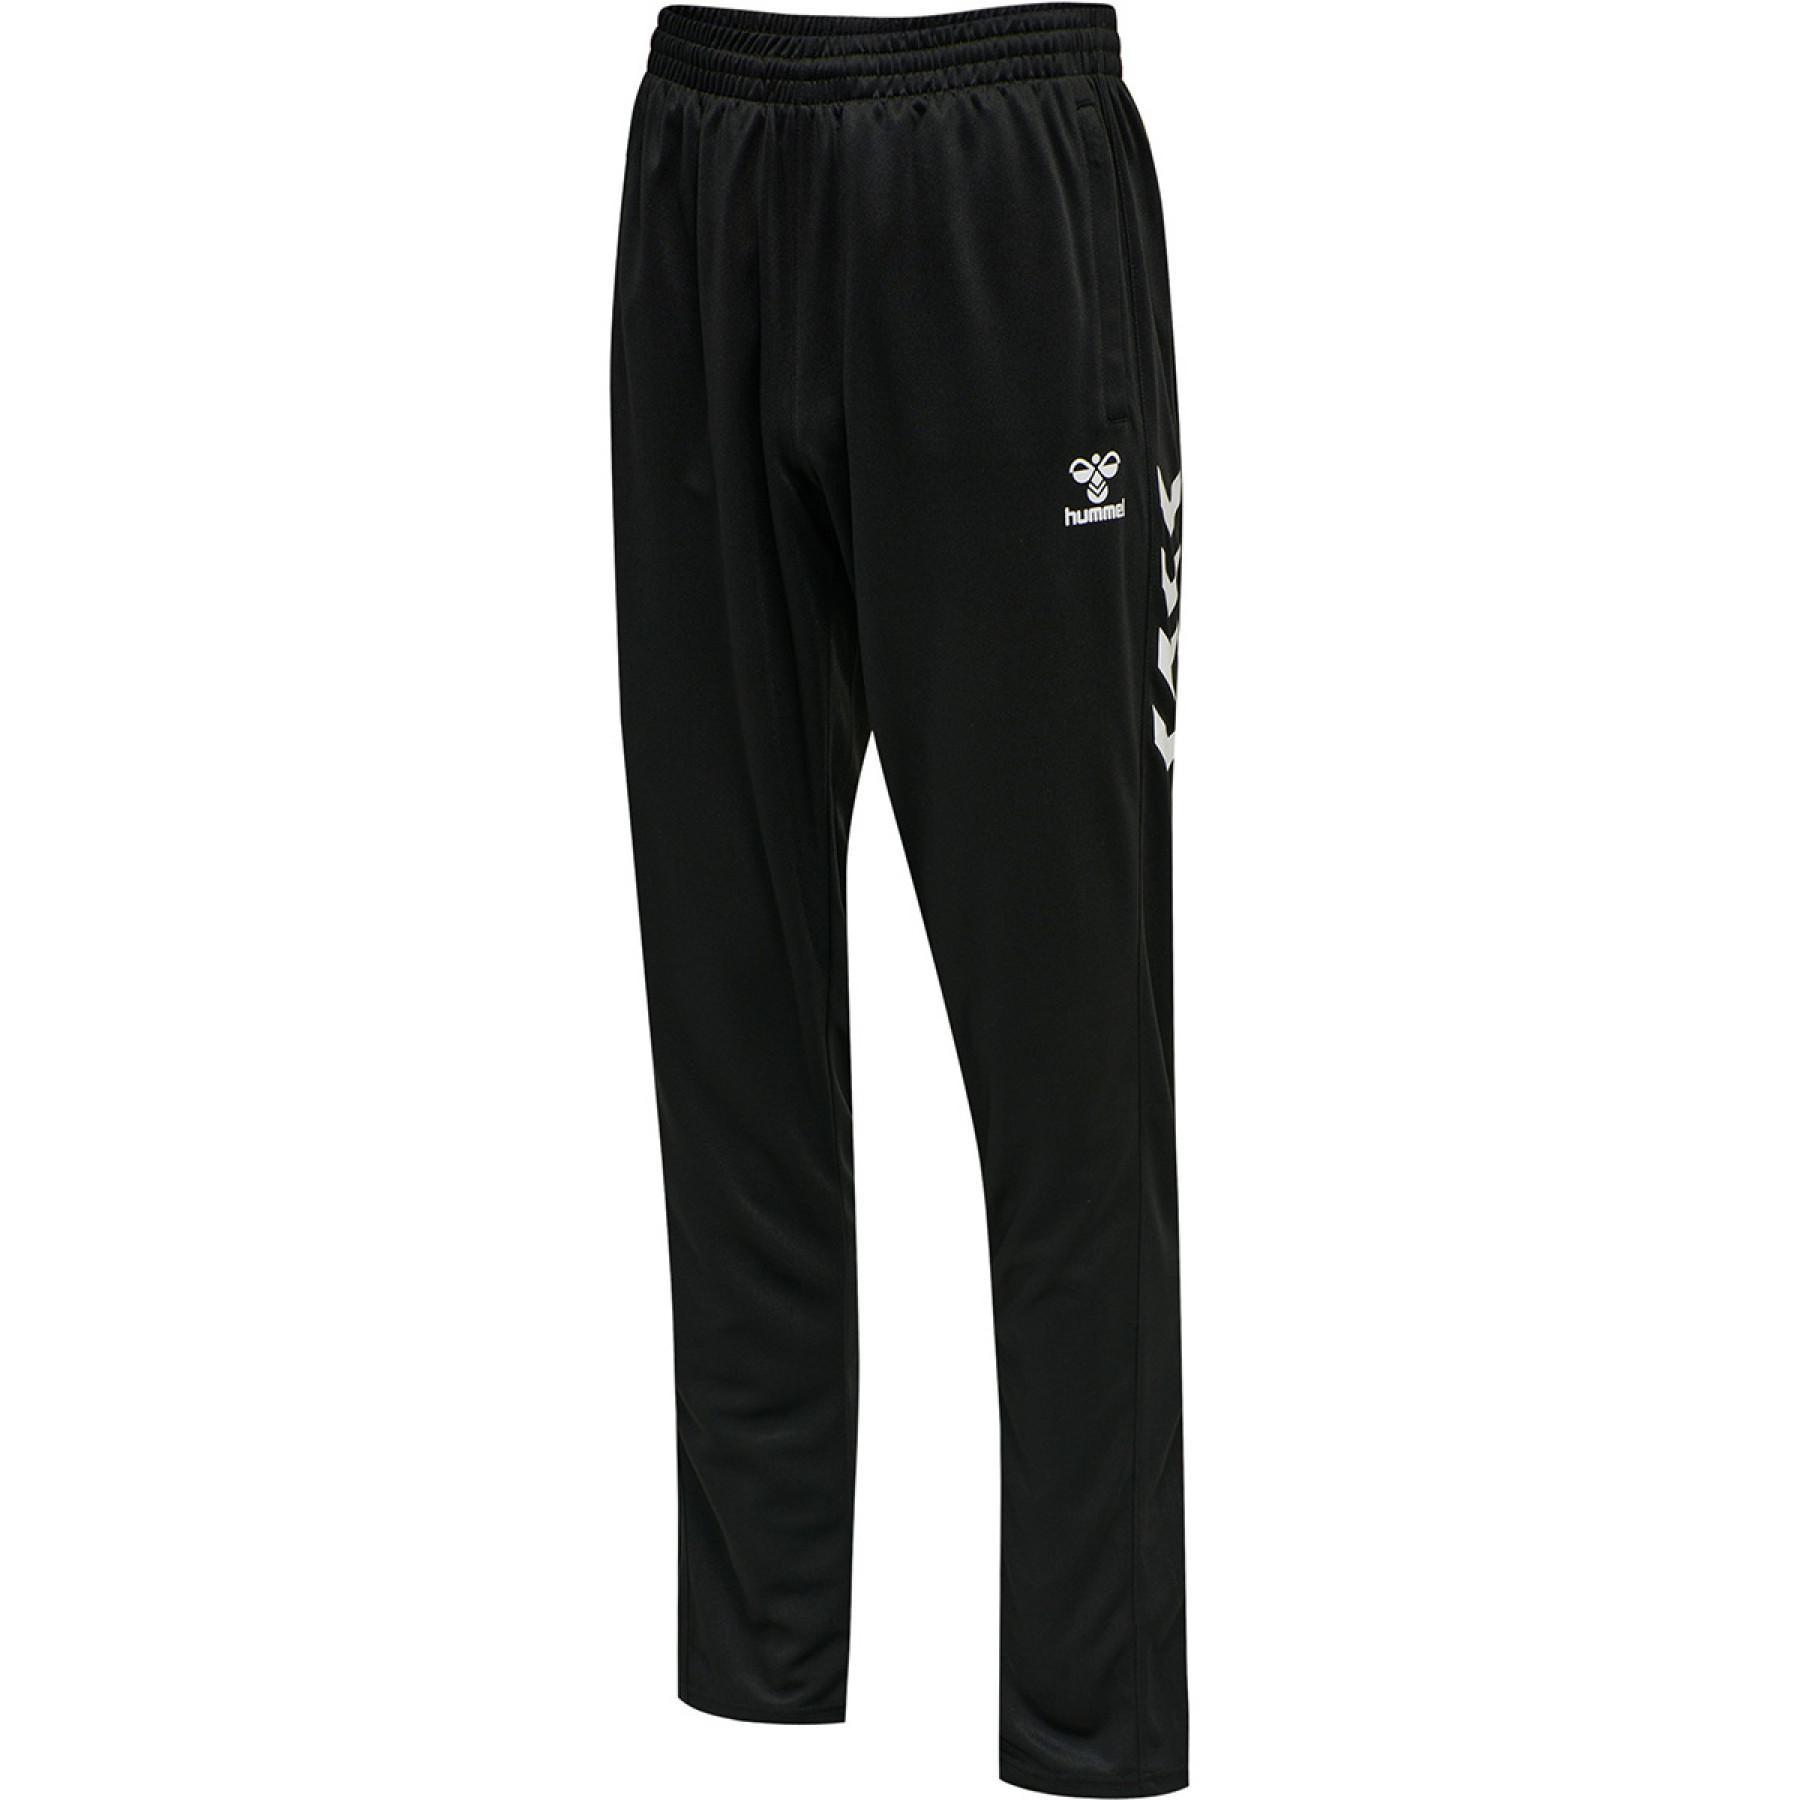 Pants Hummel hmlcore volley poly long